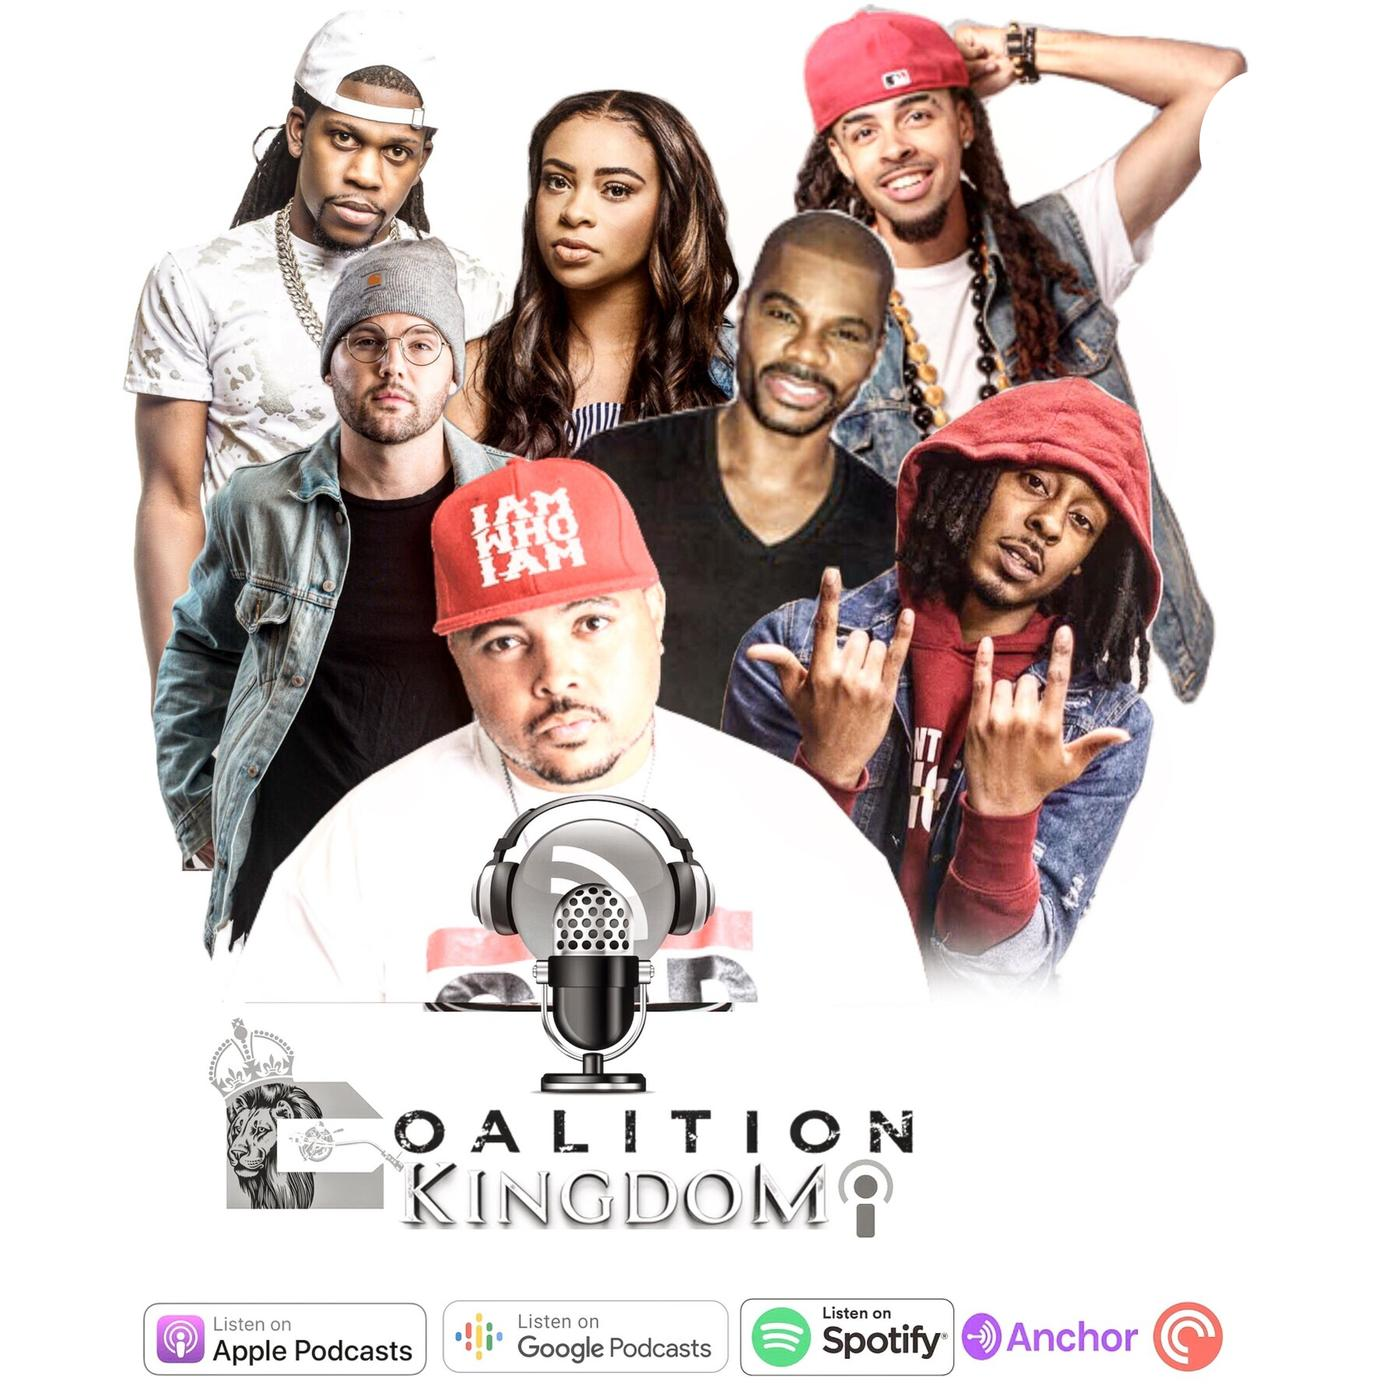 Coalition Kingdom (podcast) - COALITION KINGDOM   Listen Notes